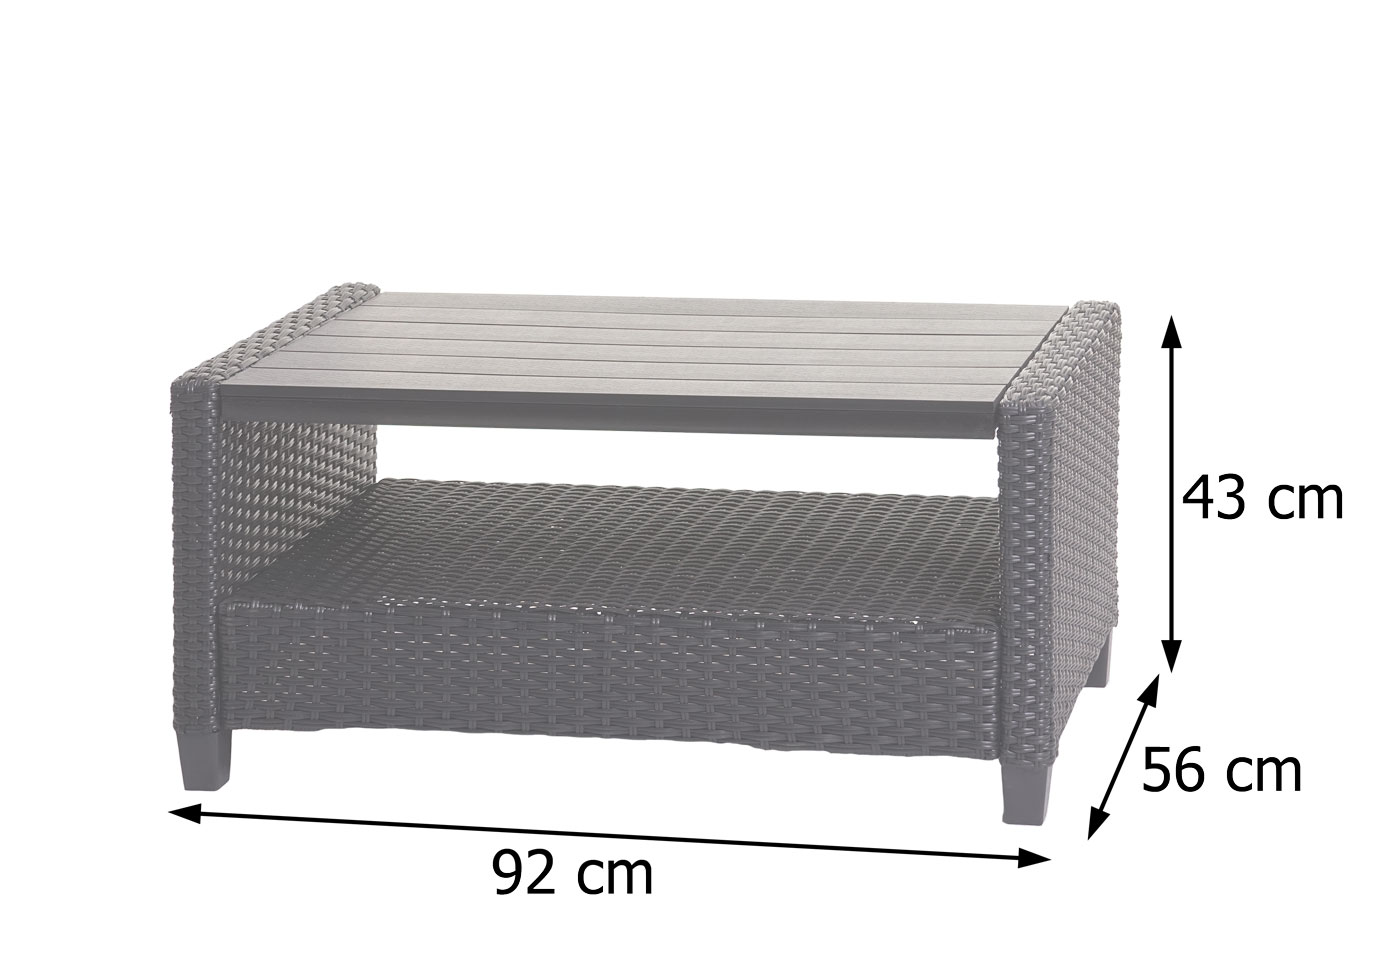 HWC-J35 Poly-Rattan Garnitur Bemaßungsbild Tisch